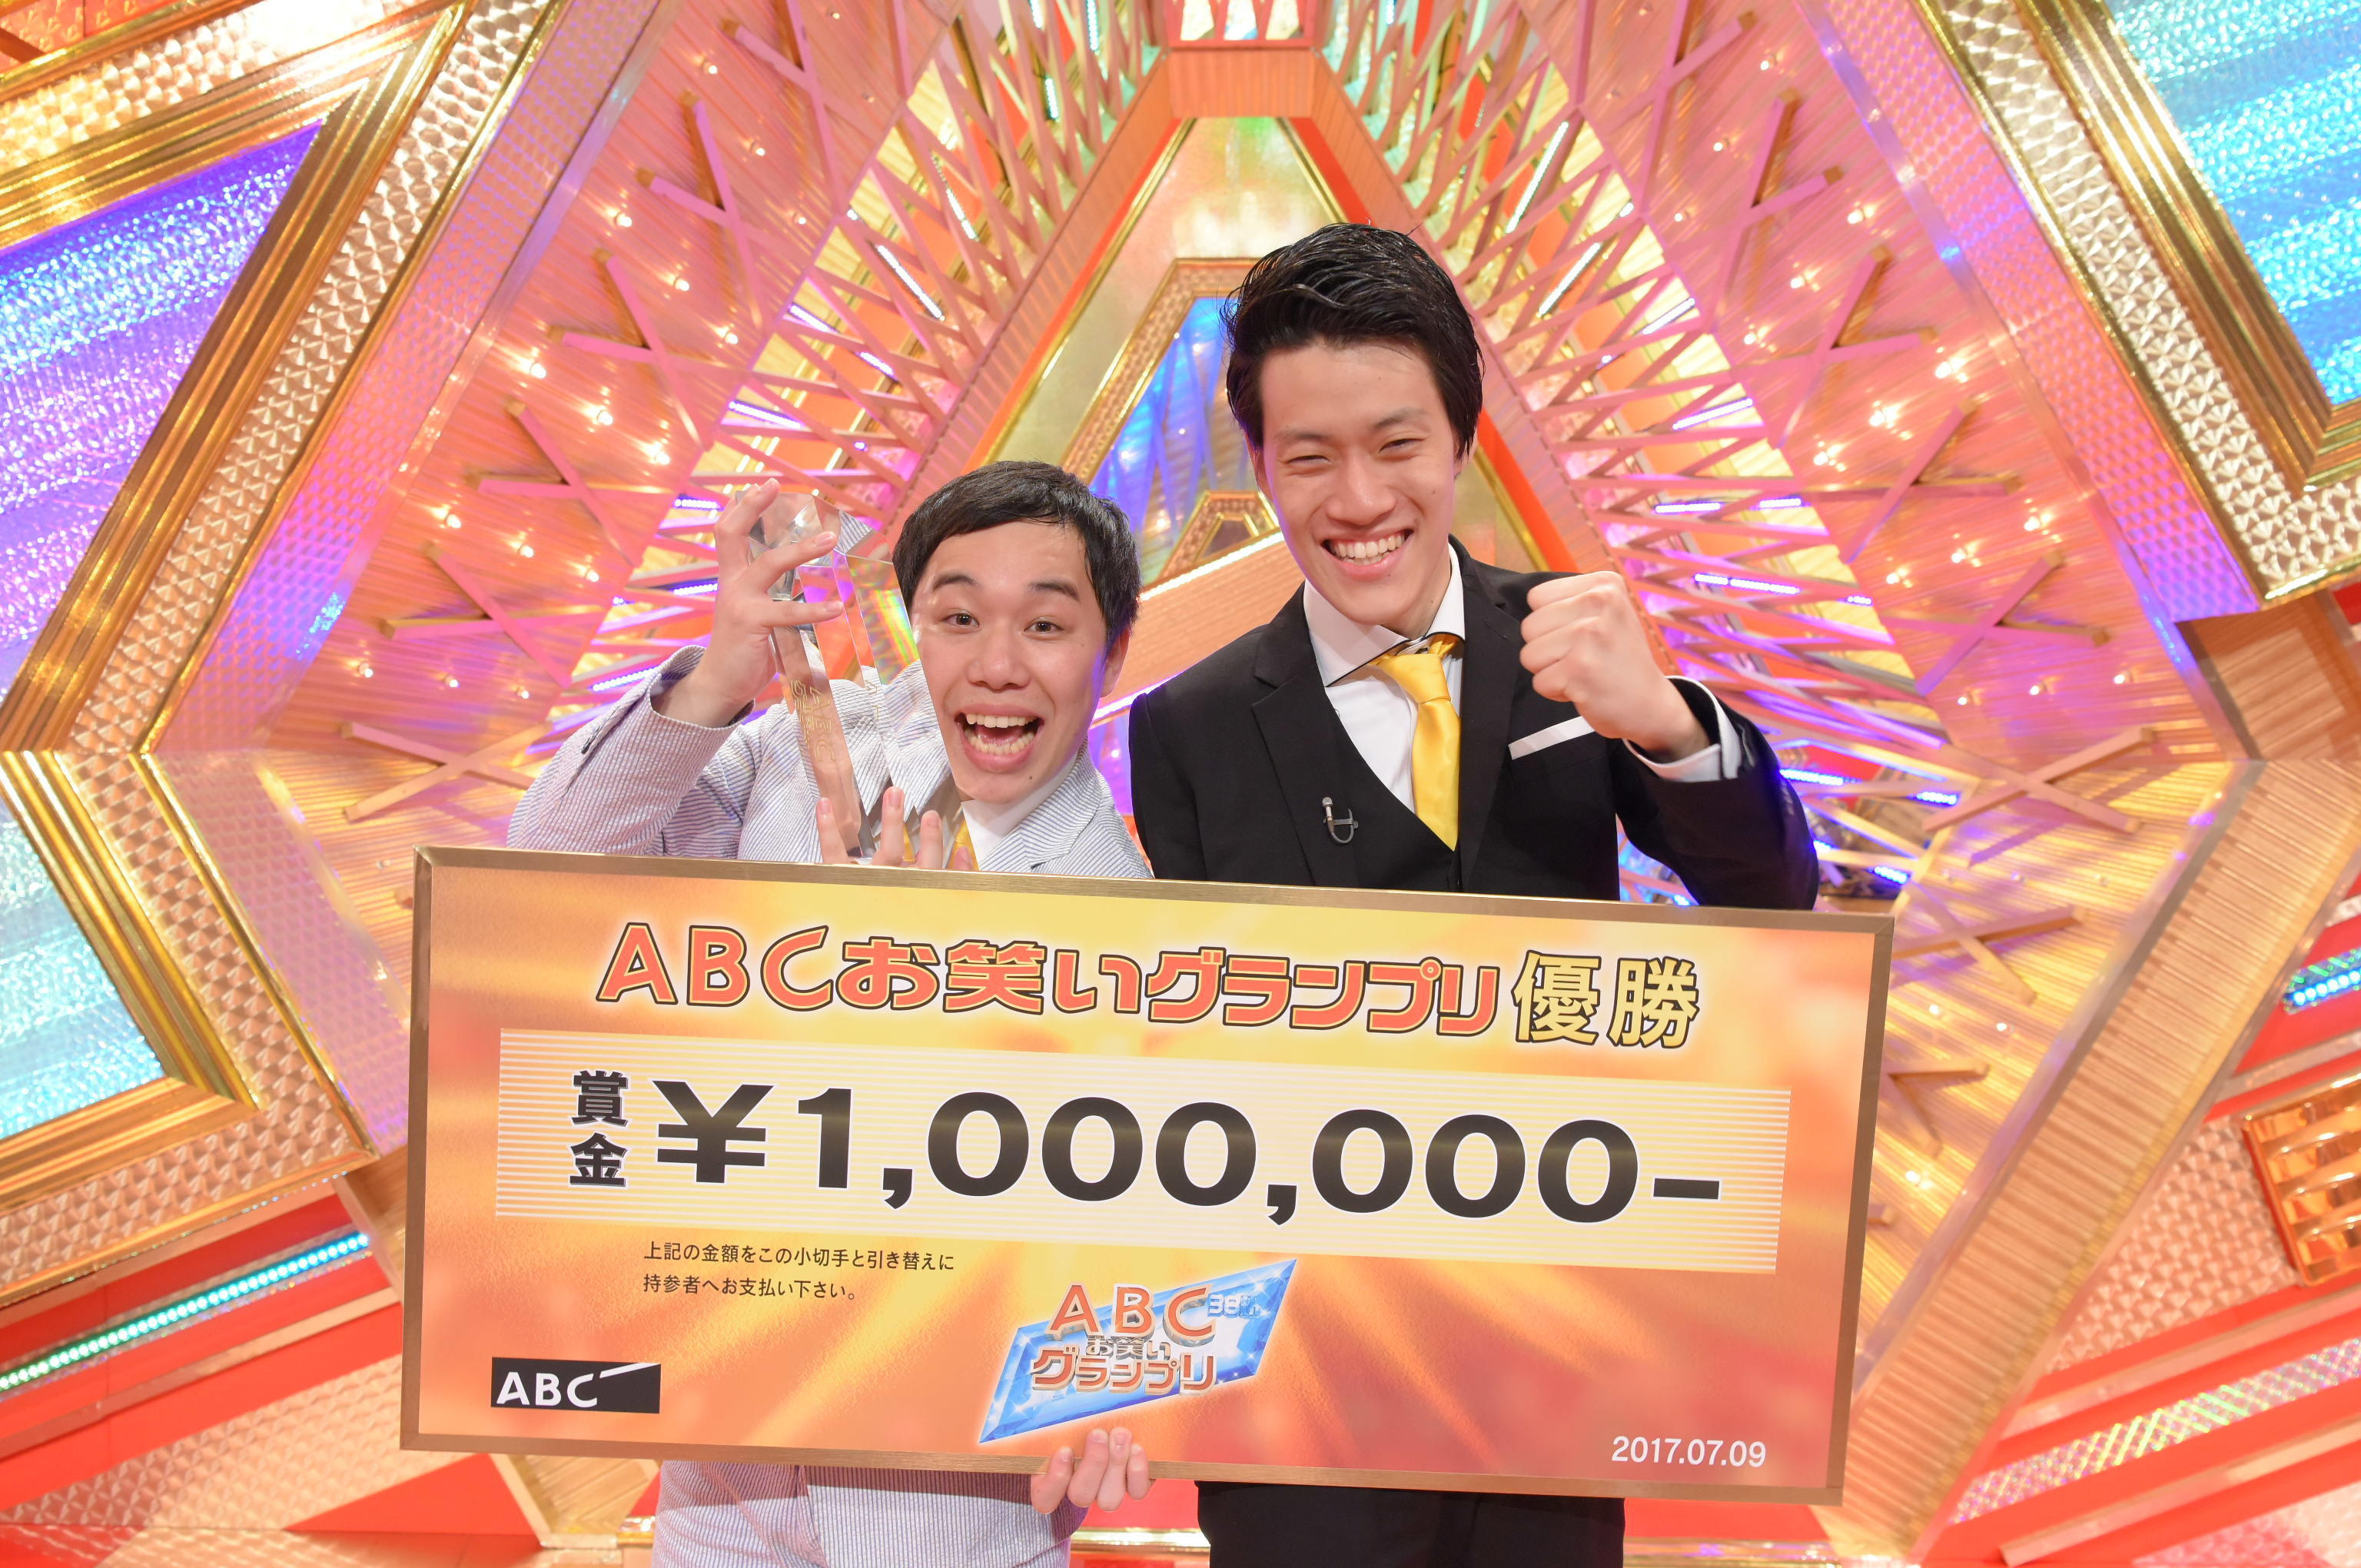 http://news.yoshimoto.co.jp/20170712103446-e47c7fe7b2d0d5f66b6a228628a2e91361091a2c.jpg